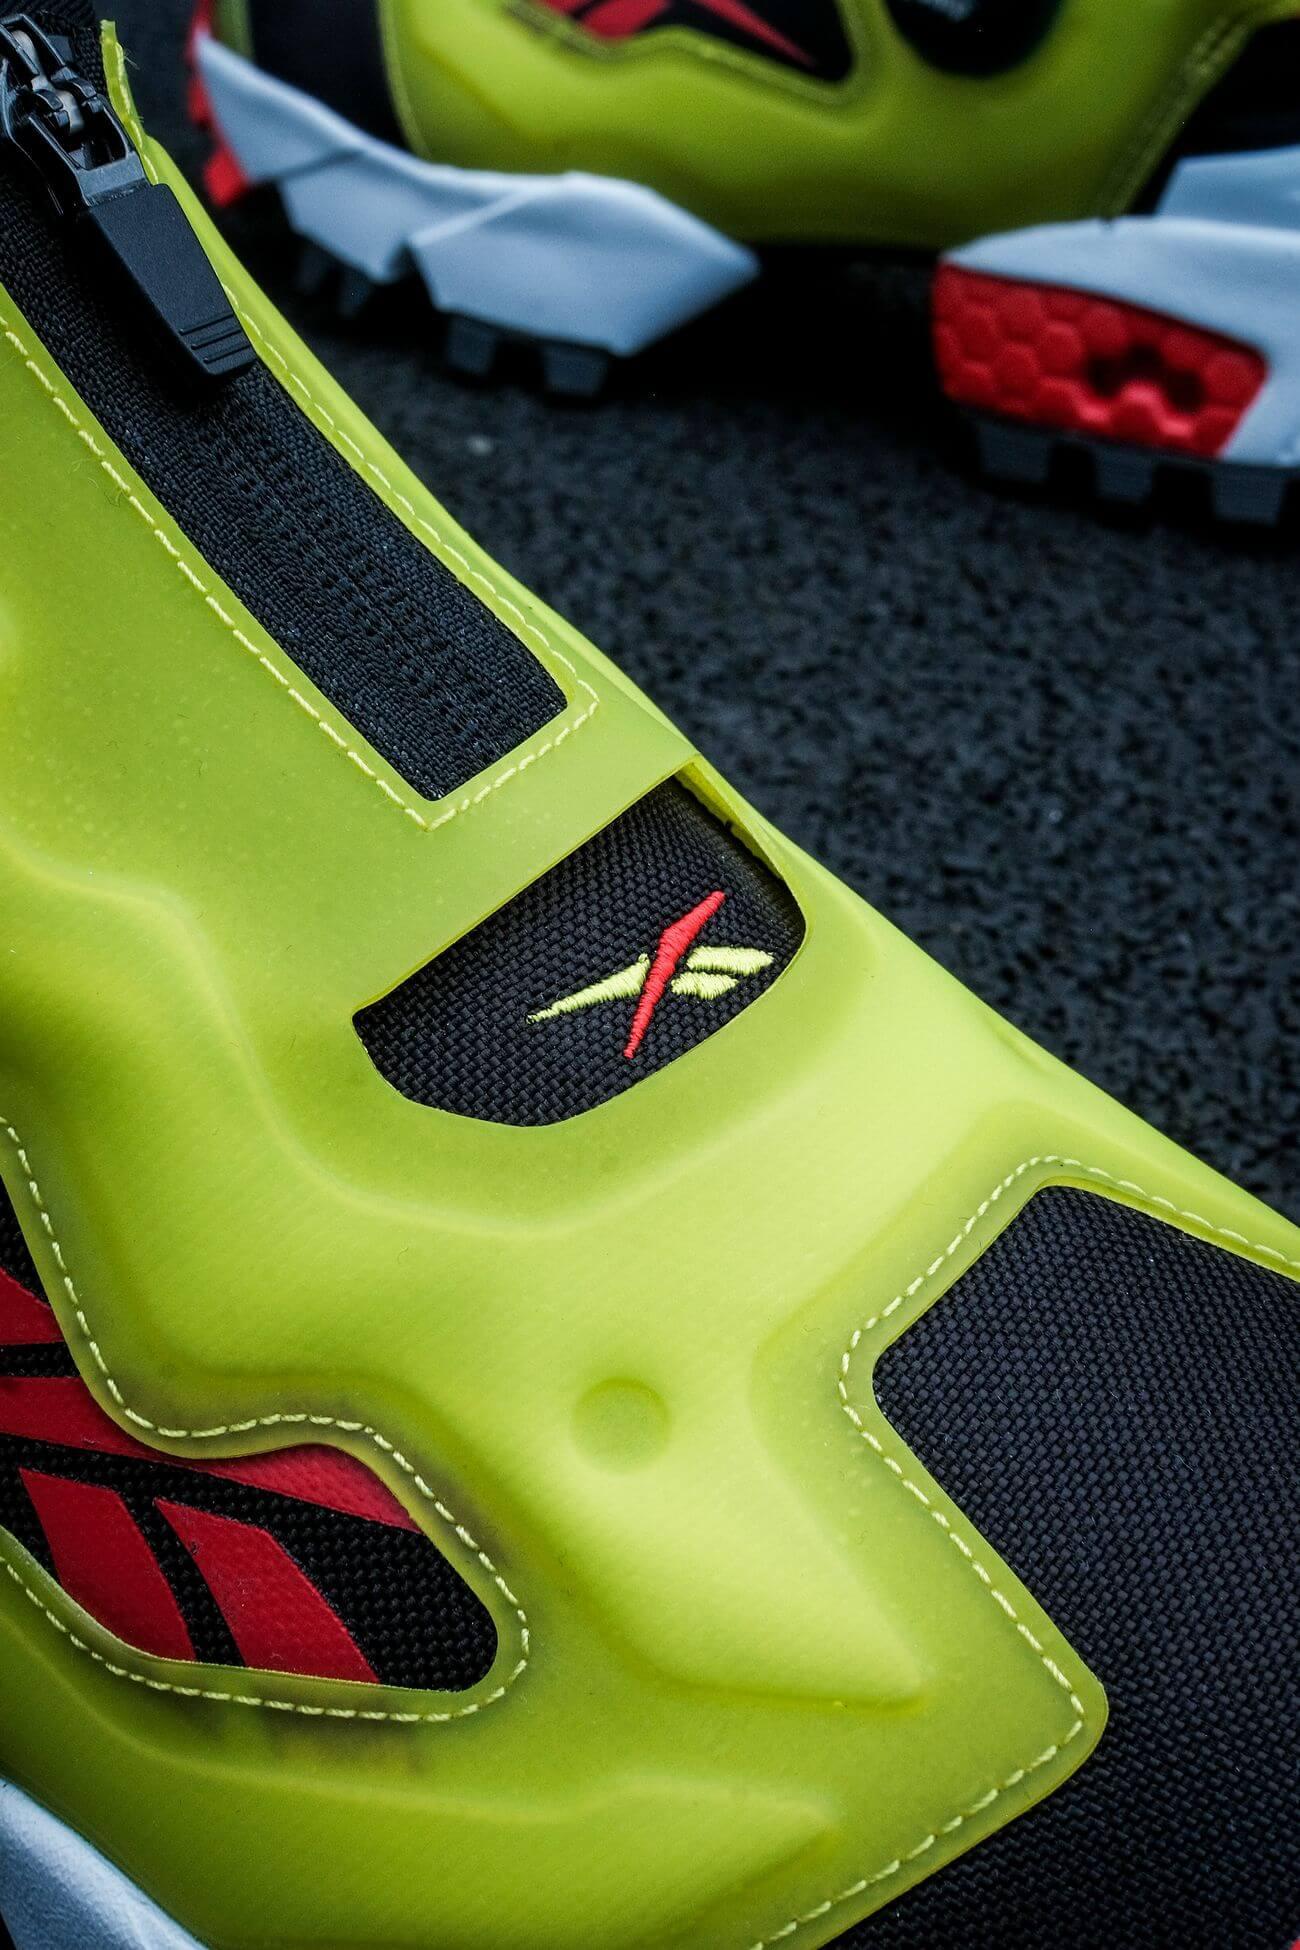 Zipper details of the Reebok - Insta Pump Fury OG Hi Gore-Tex Infinium - black/acid yellow/vector red - S23866